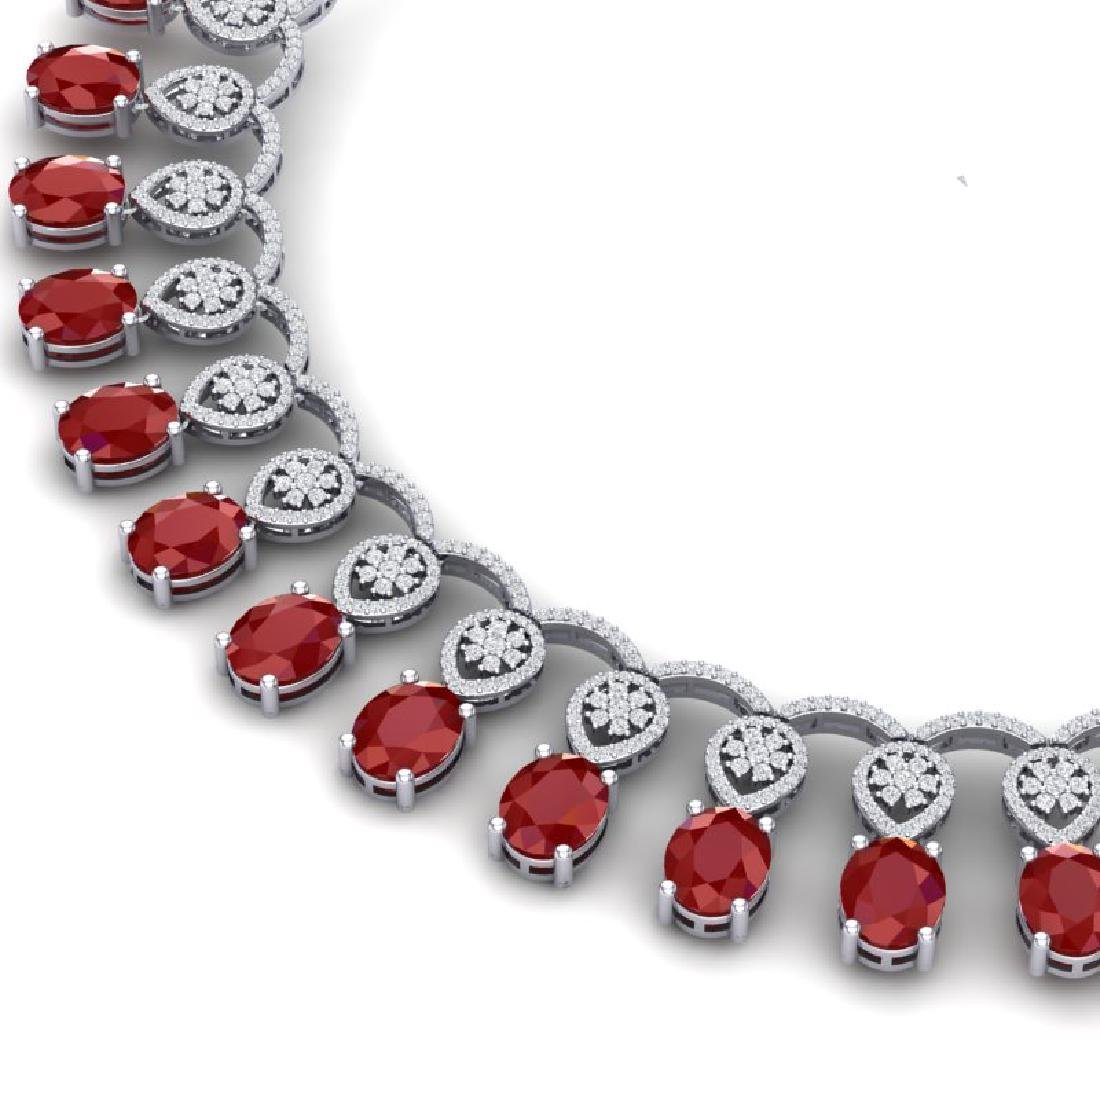 54.05 CTW Royalty Ruby & VS Diamond Necklace 18K White - 2